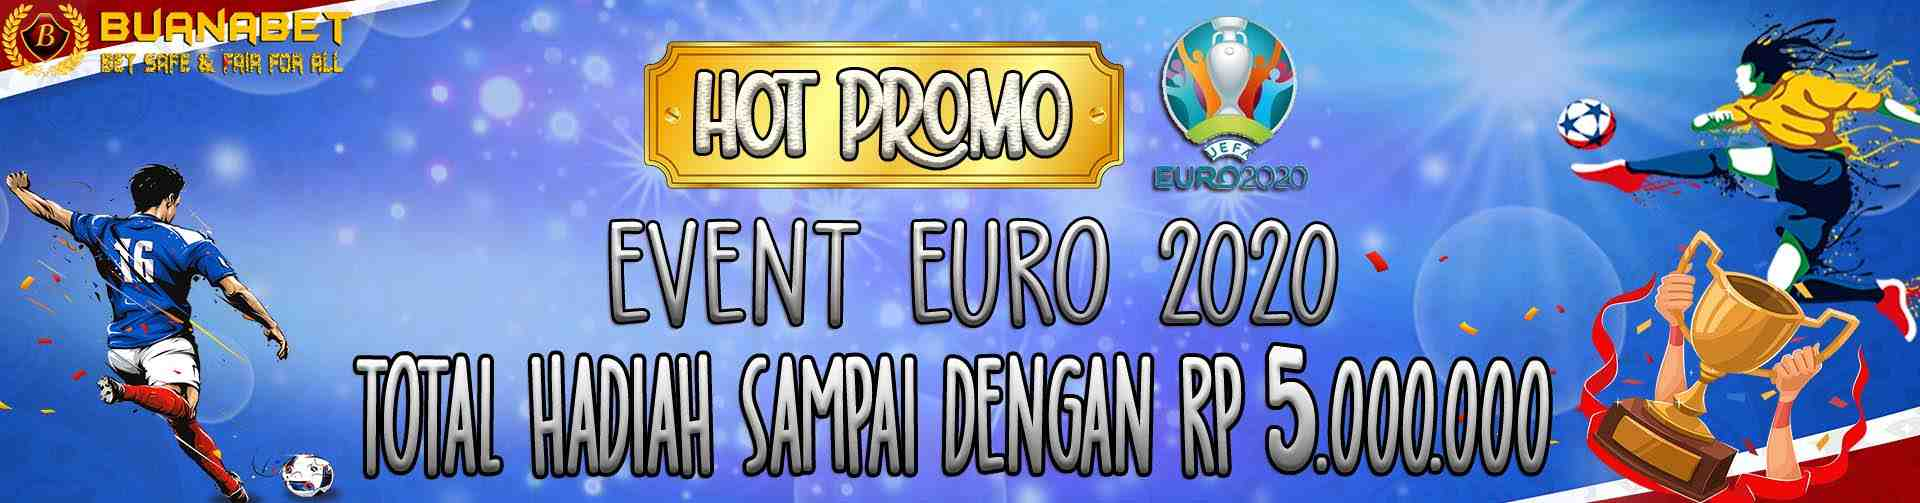 Promo Event Euro2020